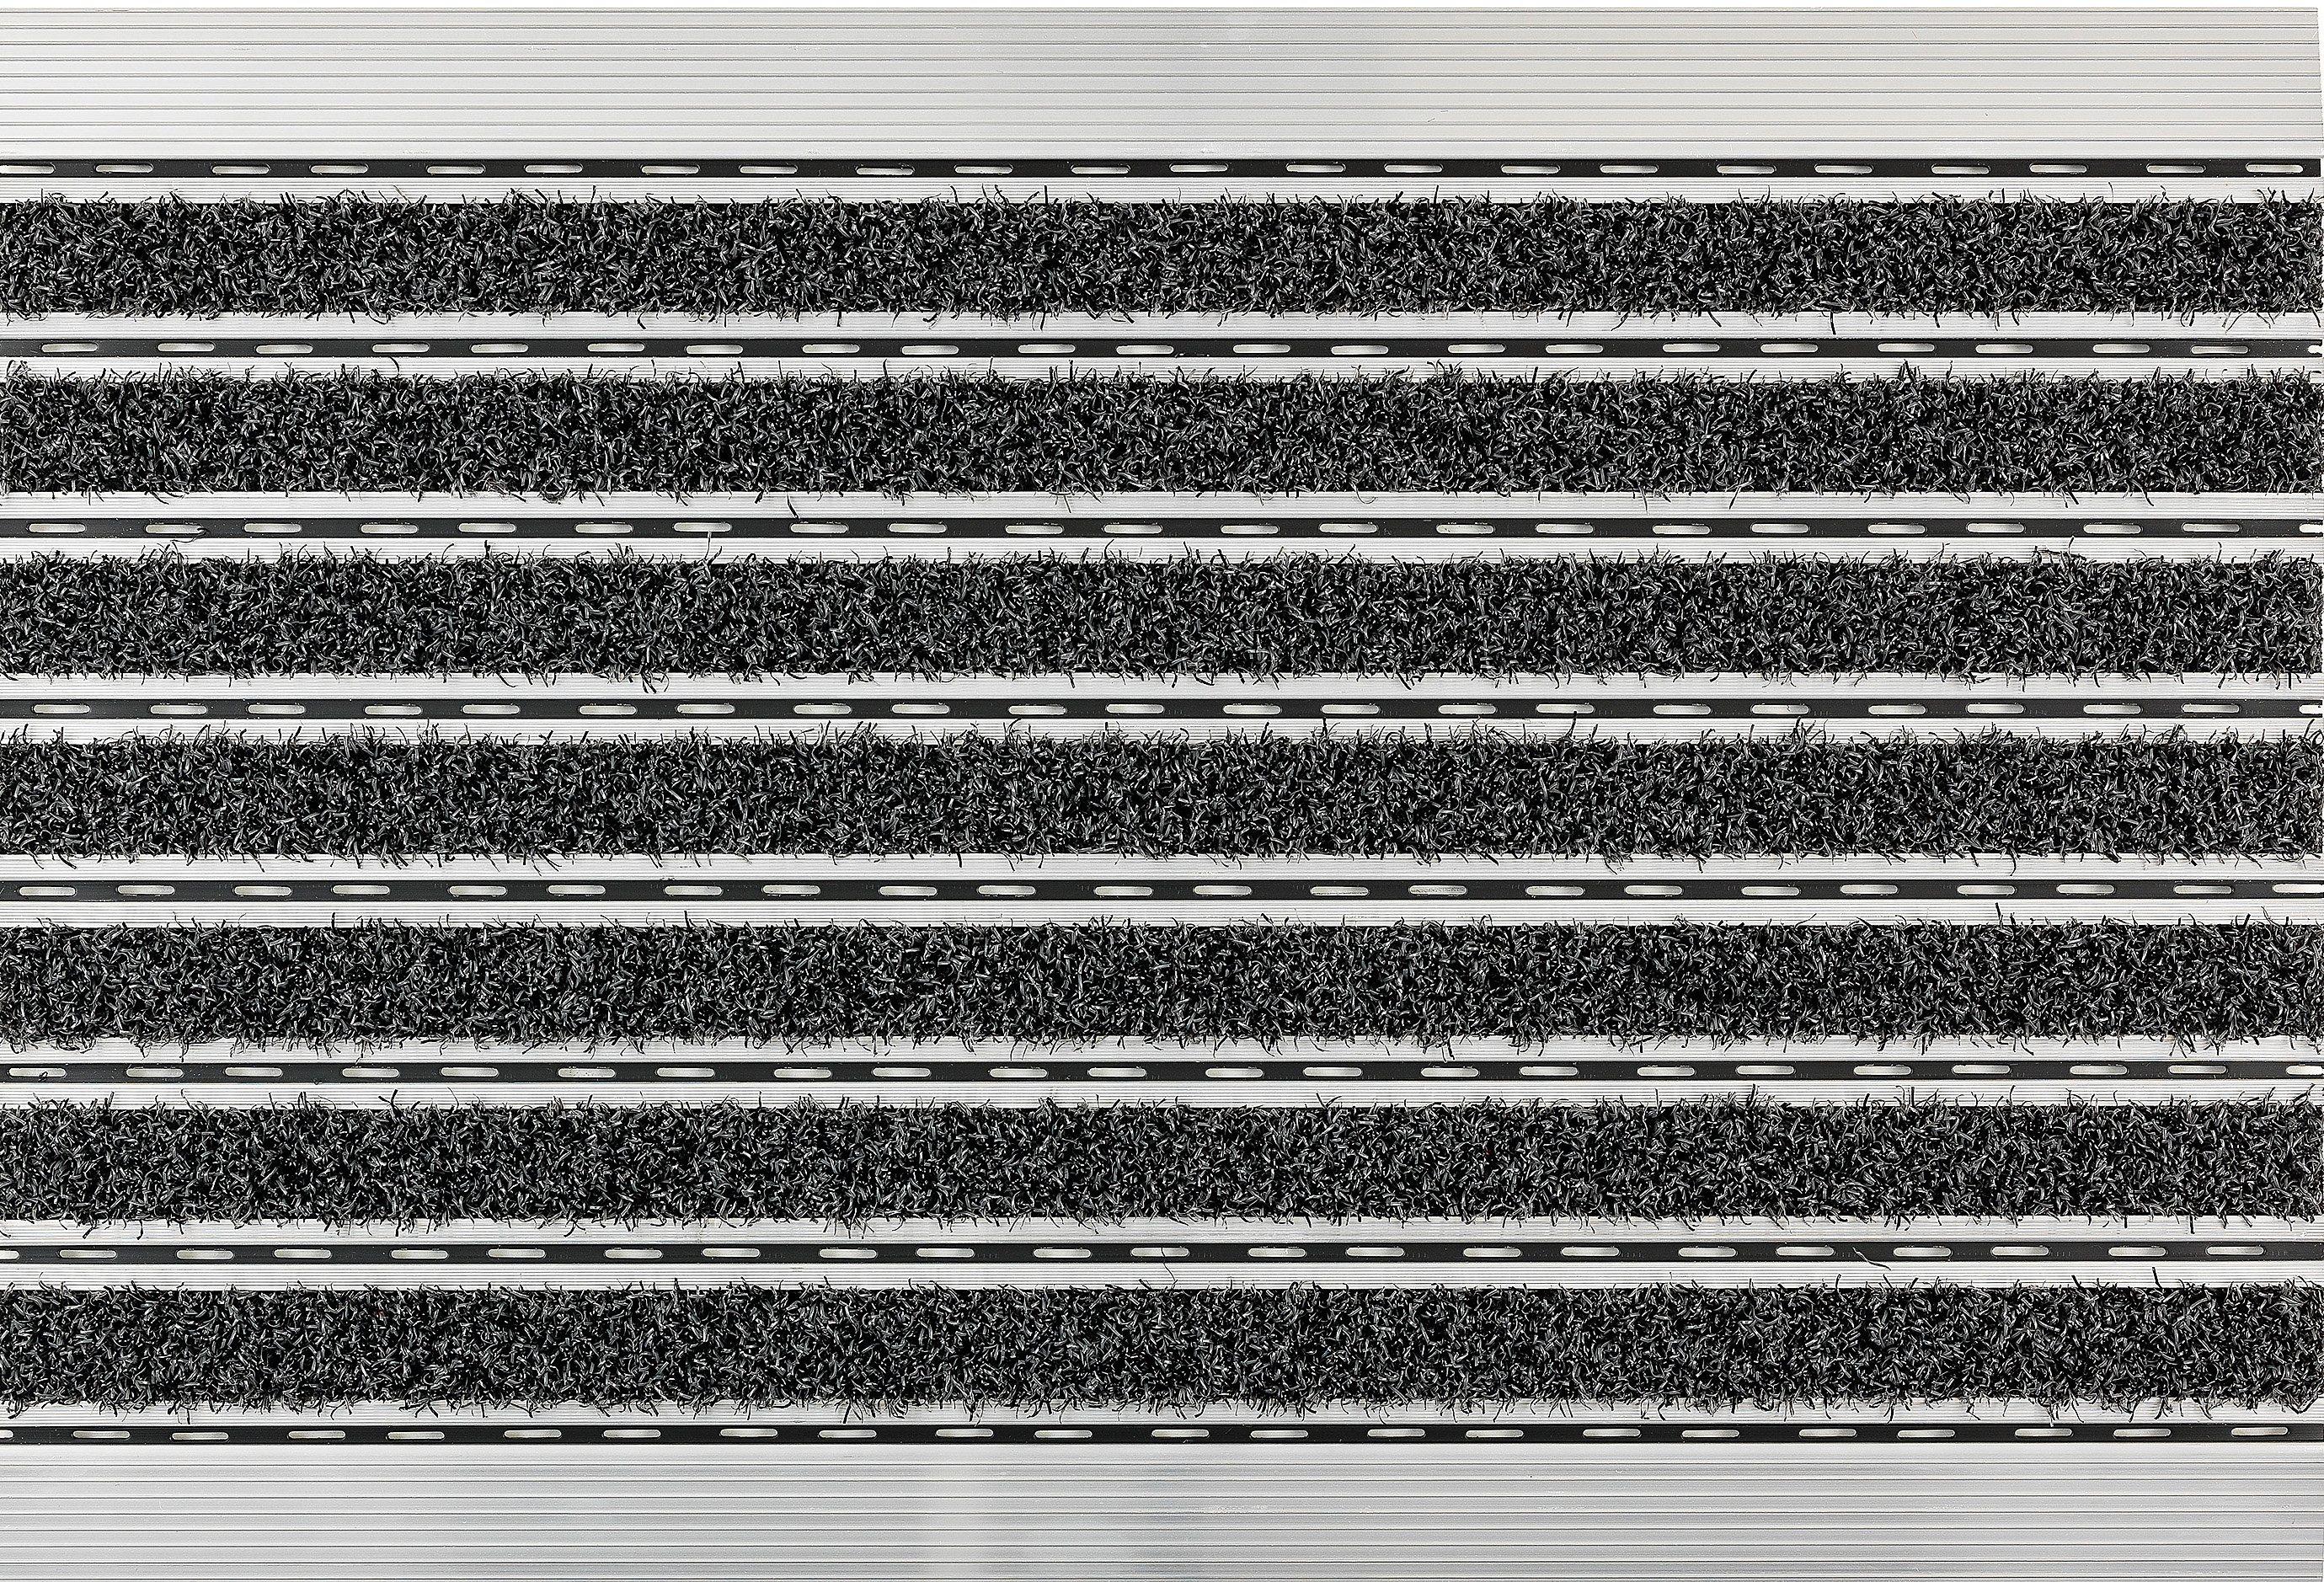 Fußmatte »Scraper«, ASTRA, rechteckig, Höhe 10 mm, mit Aluminiumrahmen | Heimtextilien > Fussmatten | ASTRA